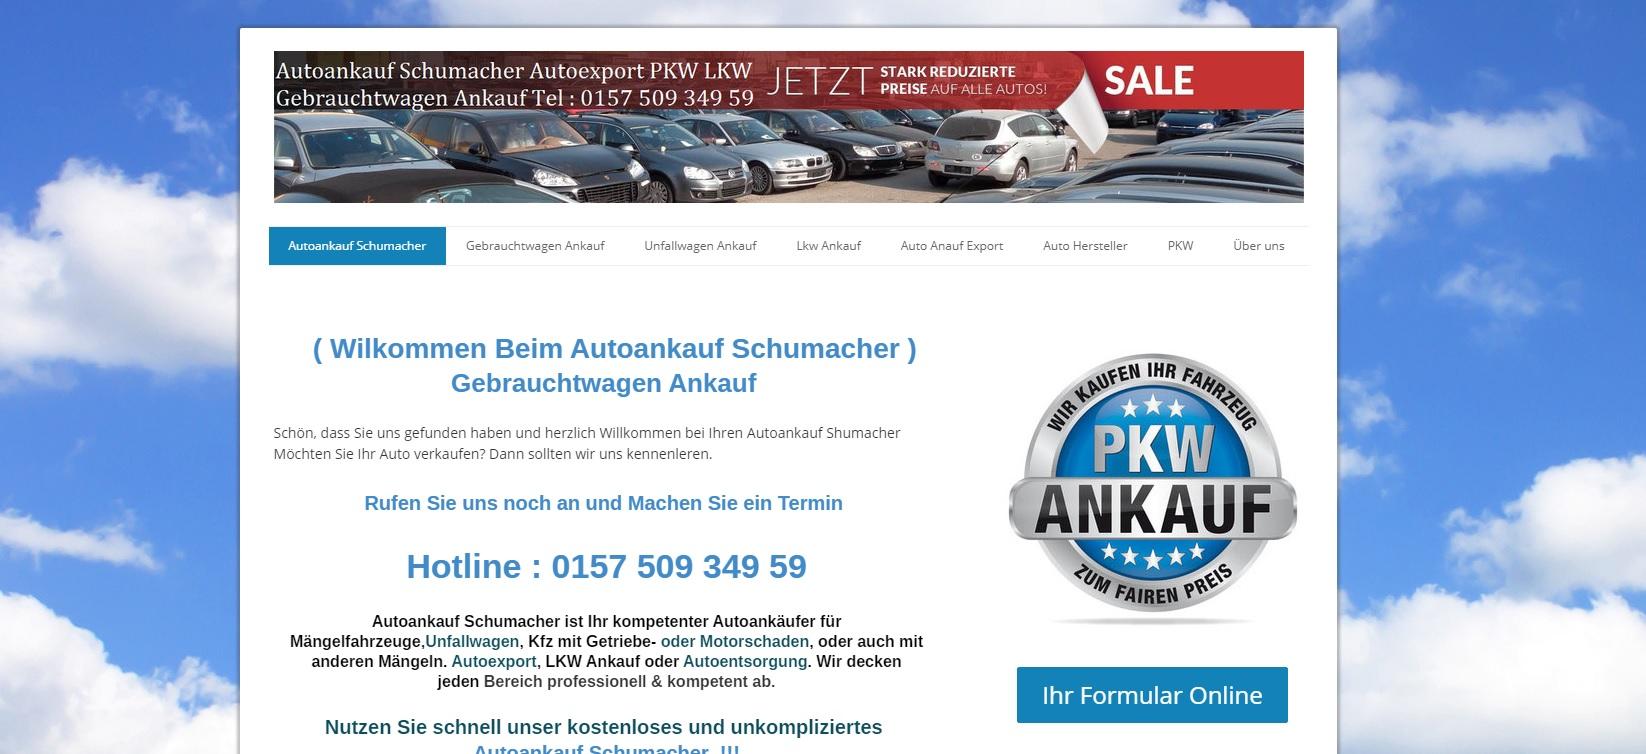 autoankauf-schumacher.de - Autoankauf Reutlingen